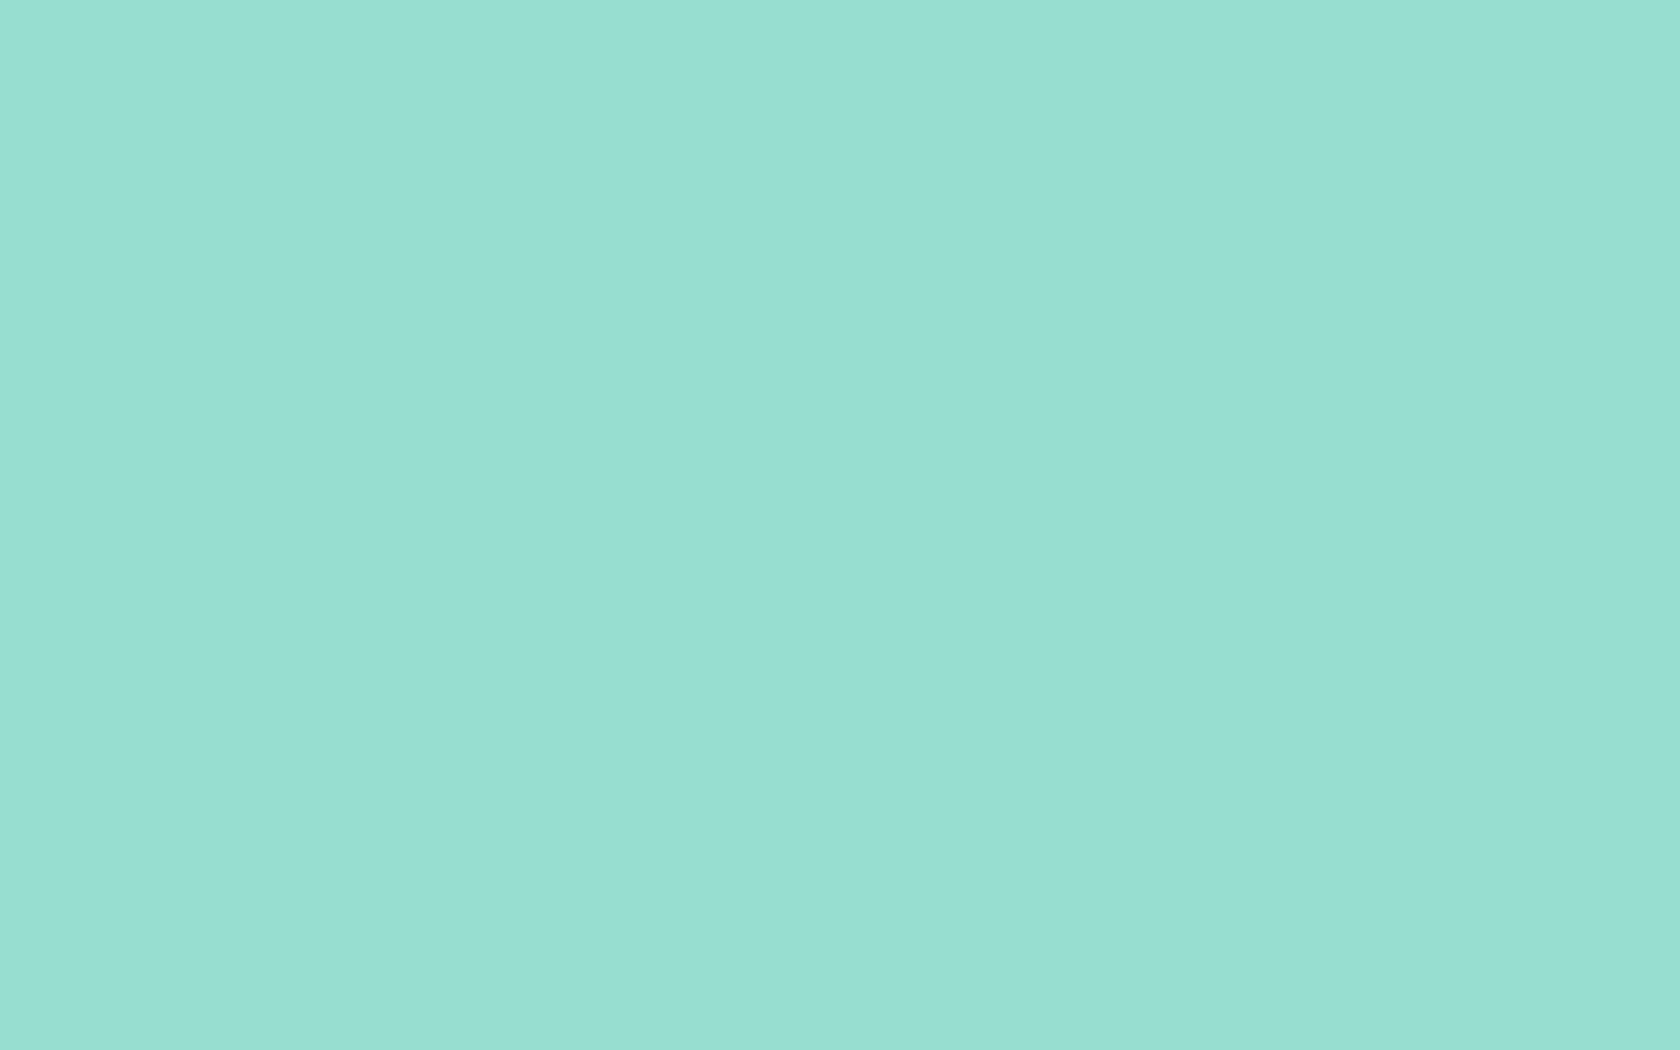 1680x1050 Pale Robin Egg Blue Solid Color Background